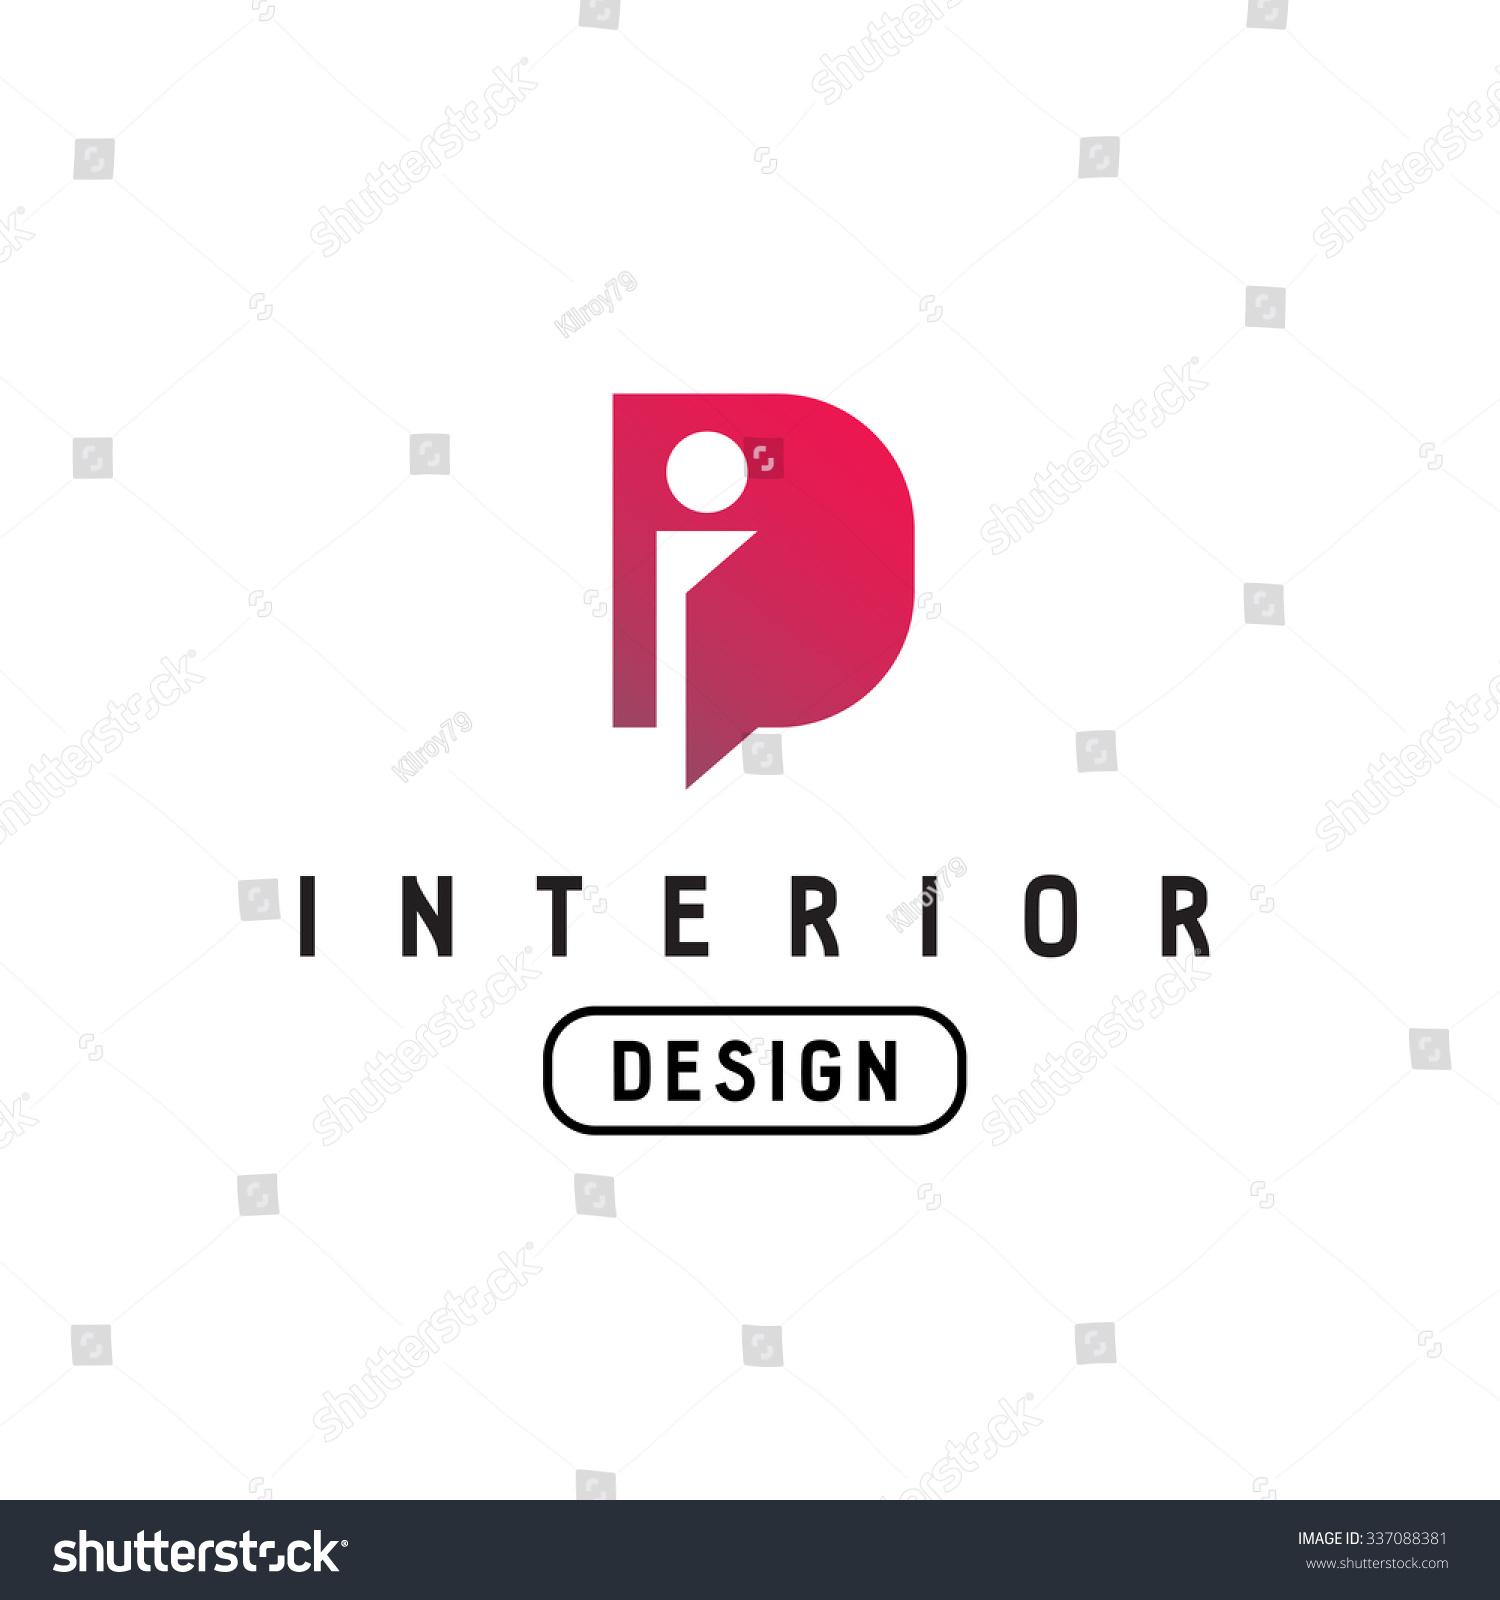 Letter I And D Monogram Logo Interior Design Abbreviation Ligature Sign Open Door Concept